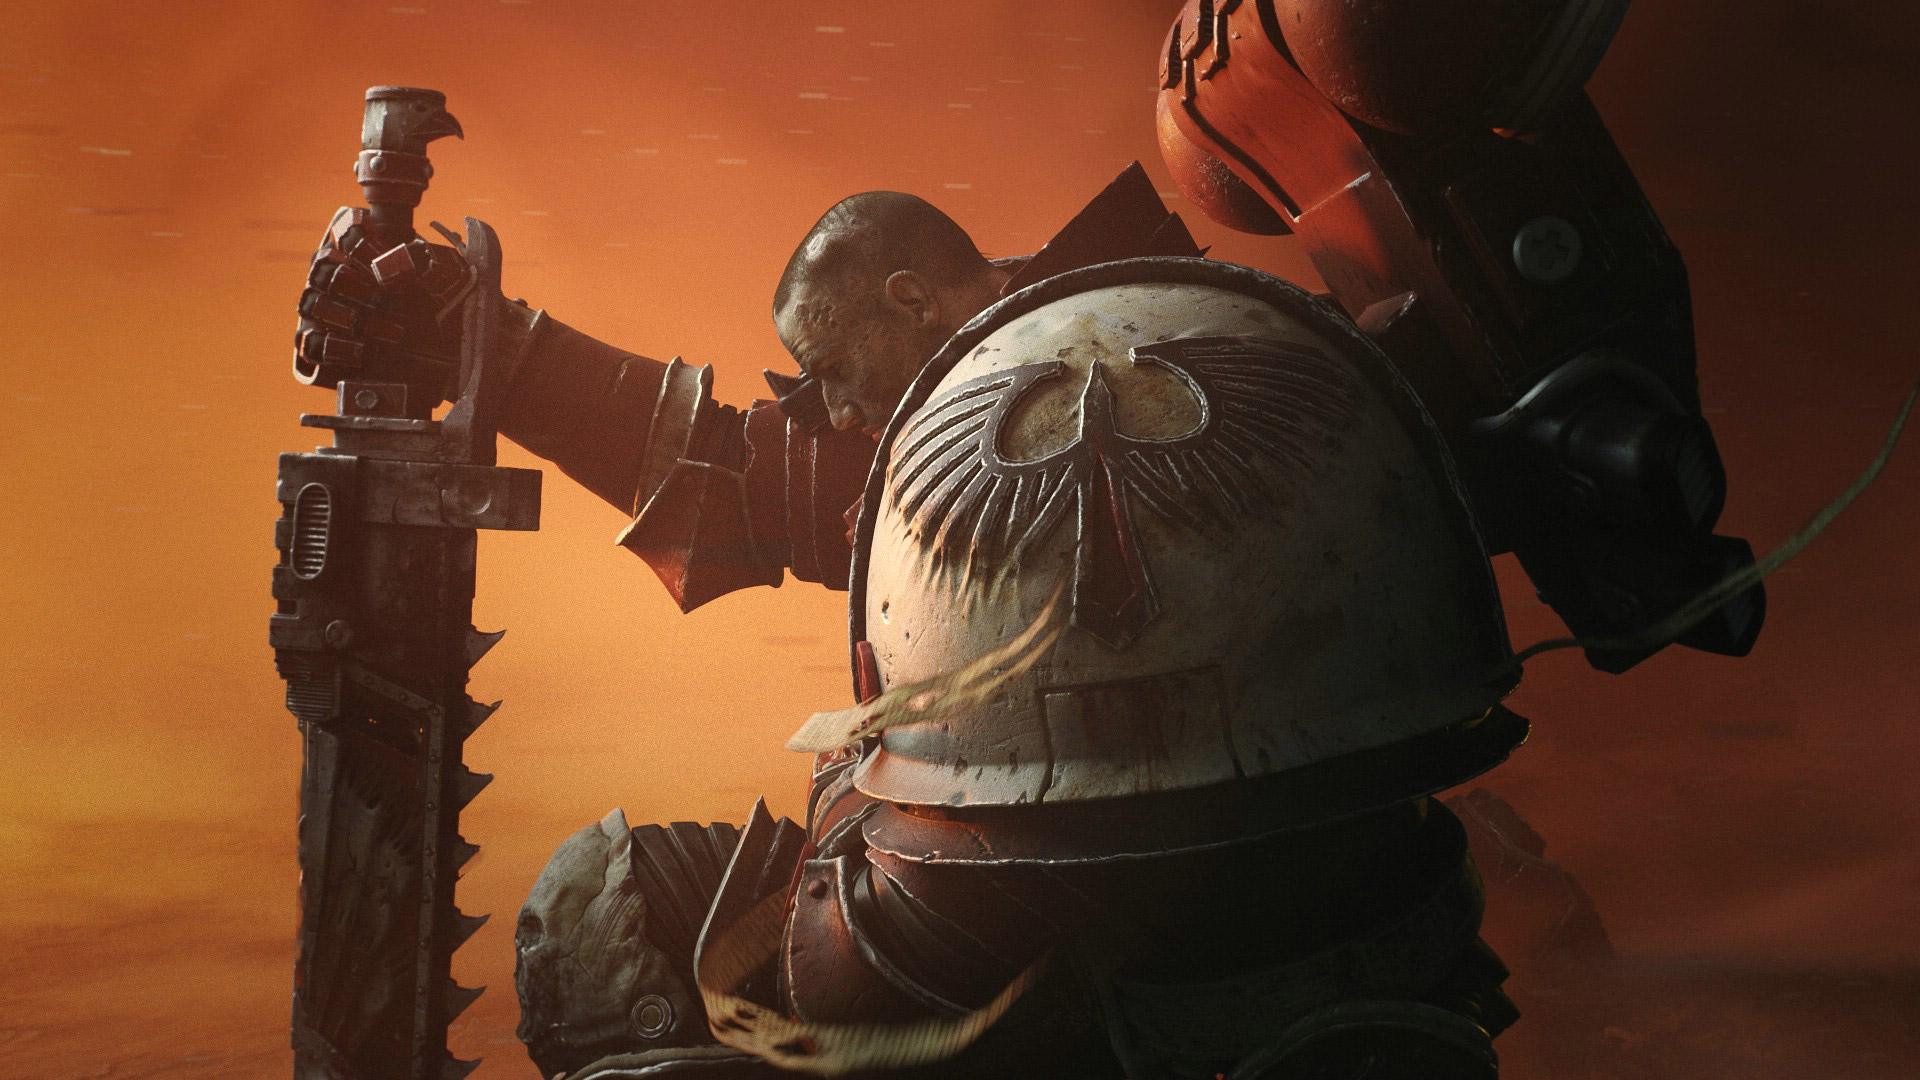 Free Warhammer 40000: Dawn of War III Wallpaper in 1920x1080